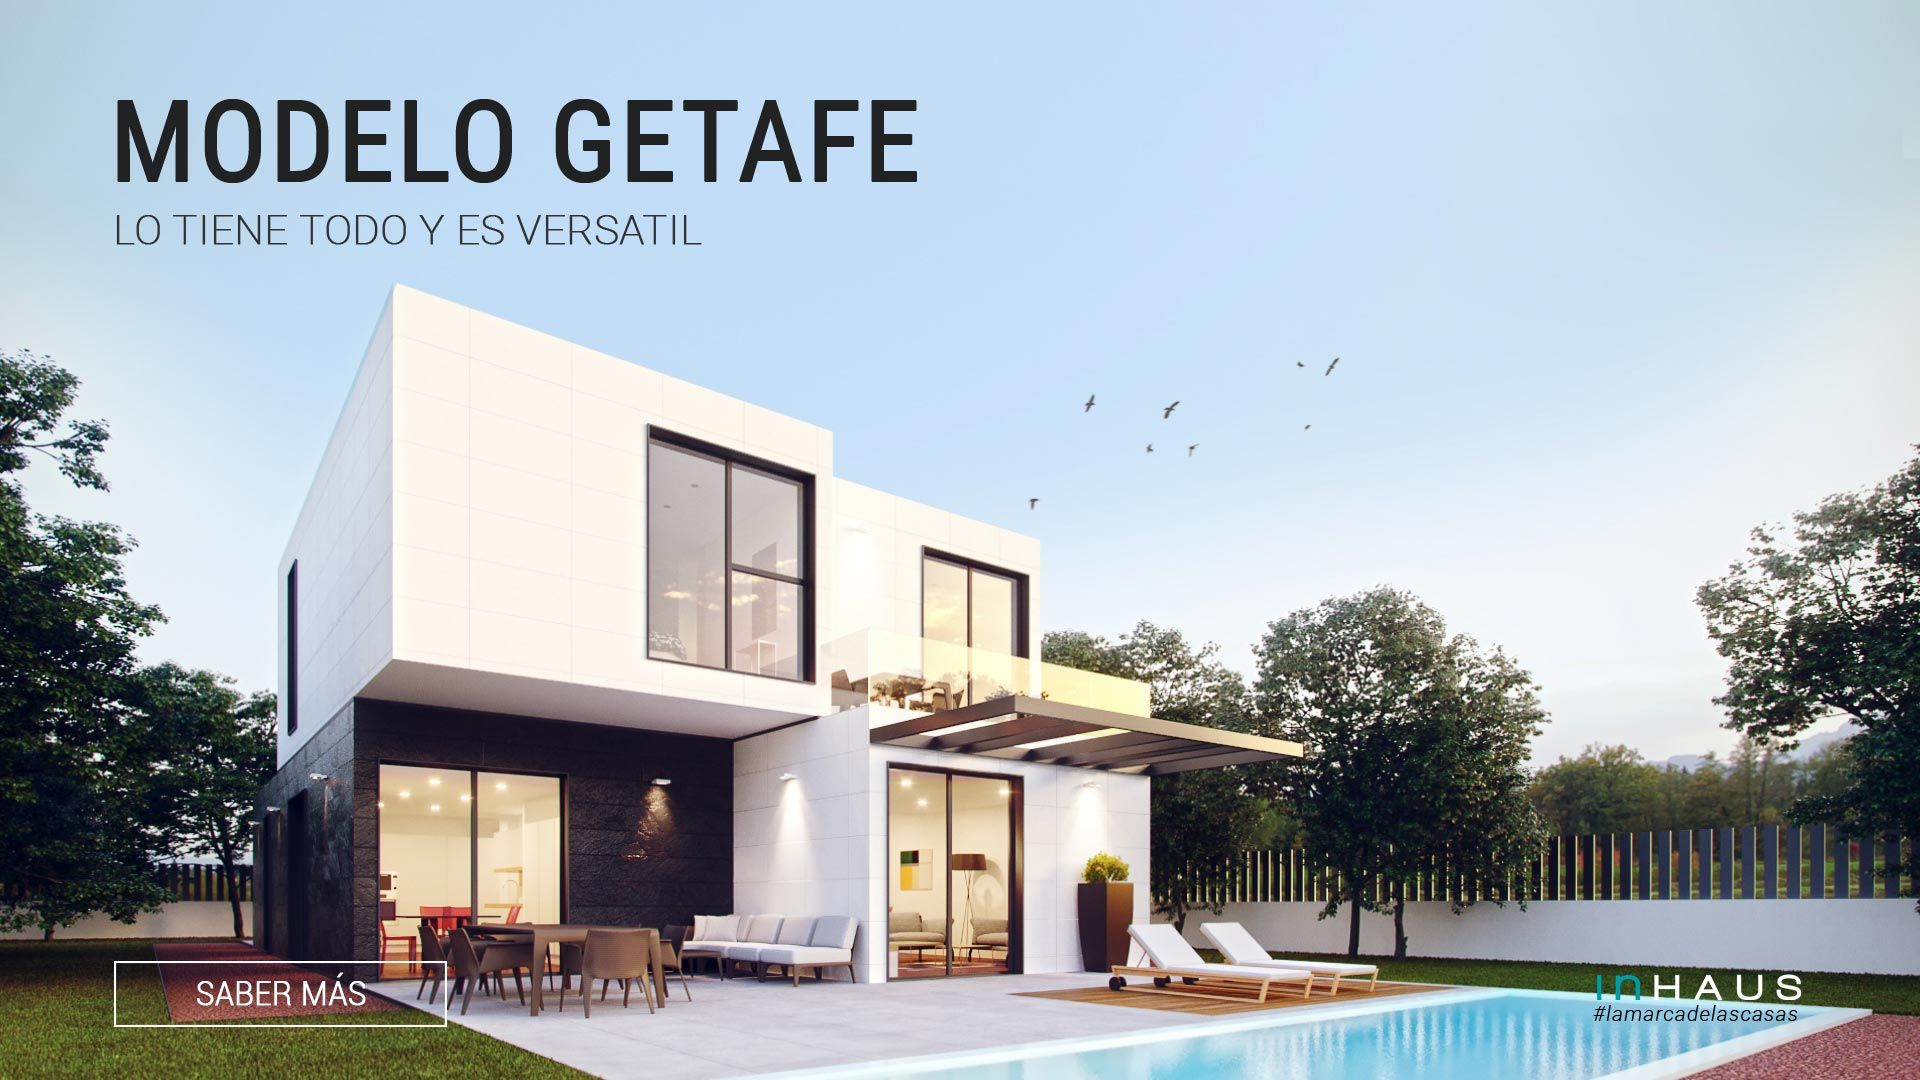 Casa prefabricada de dise o modelo getafe 5d 2p was - Casas prefabricadas guadalajara ...